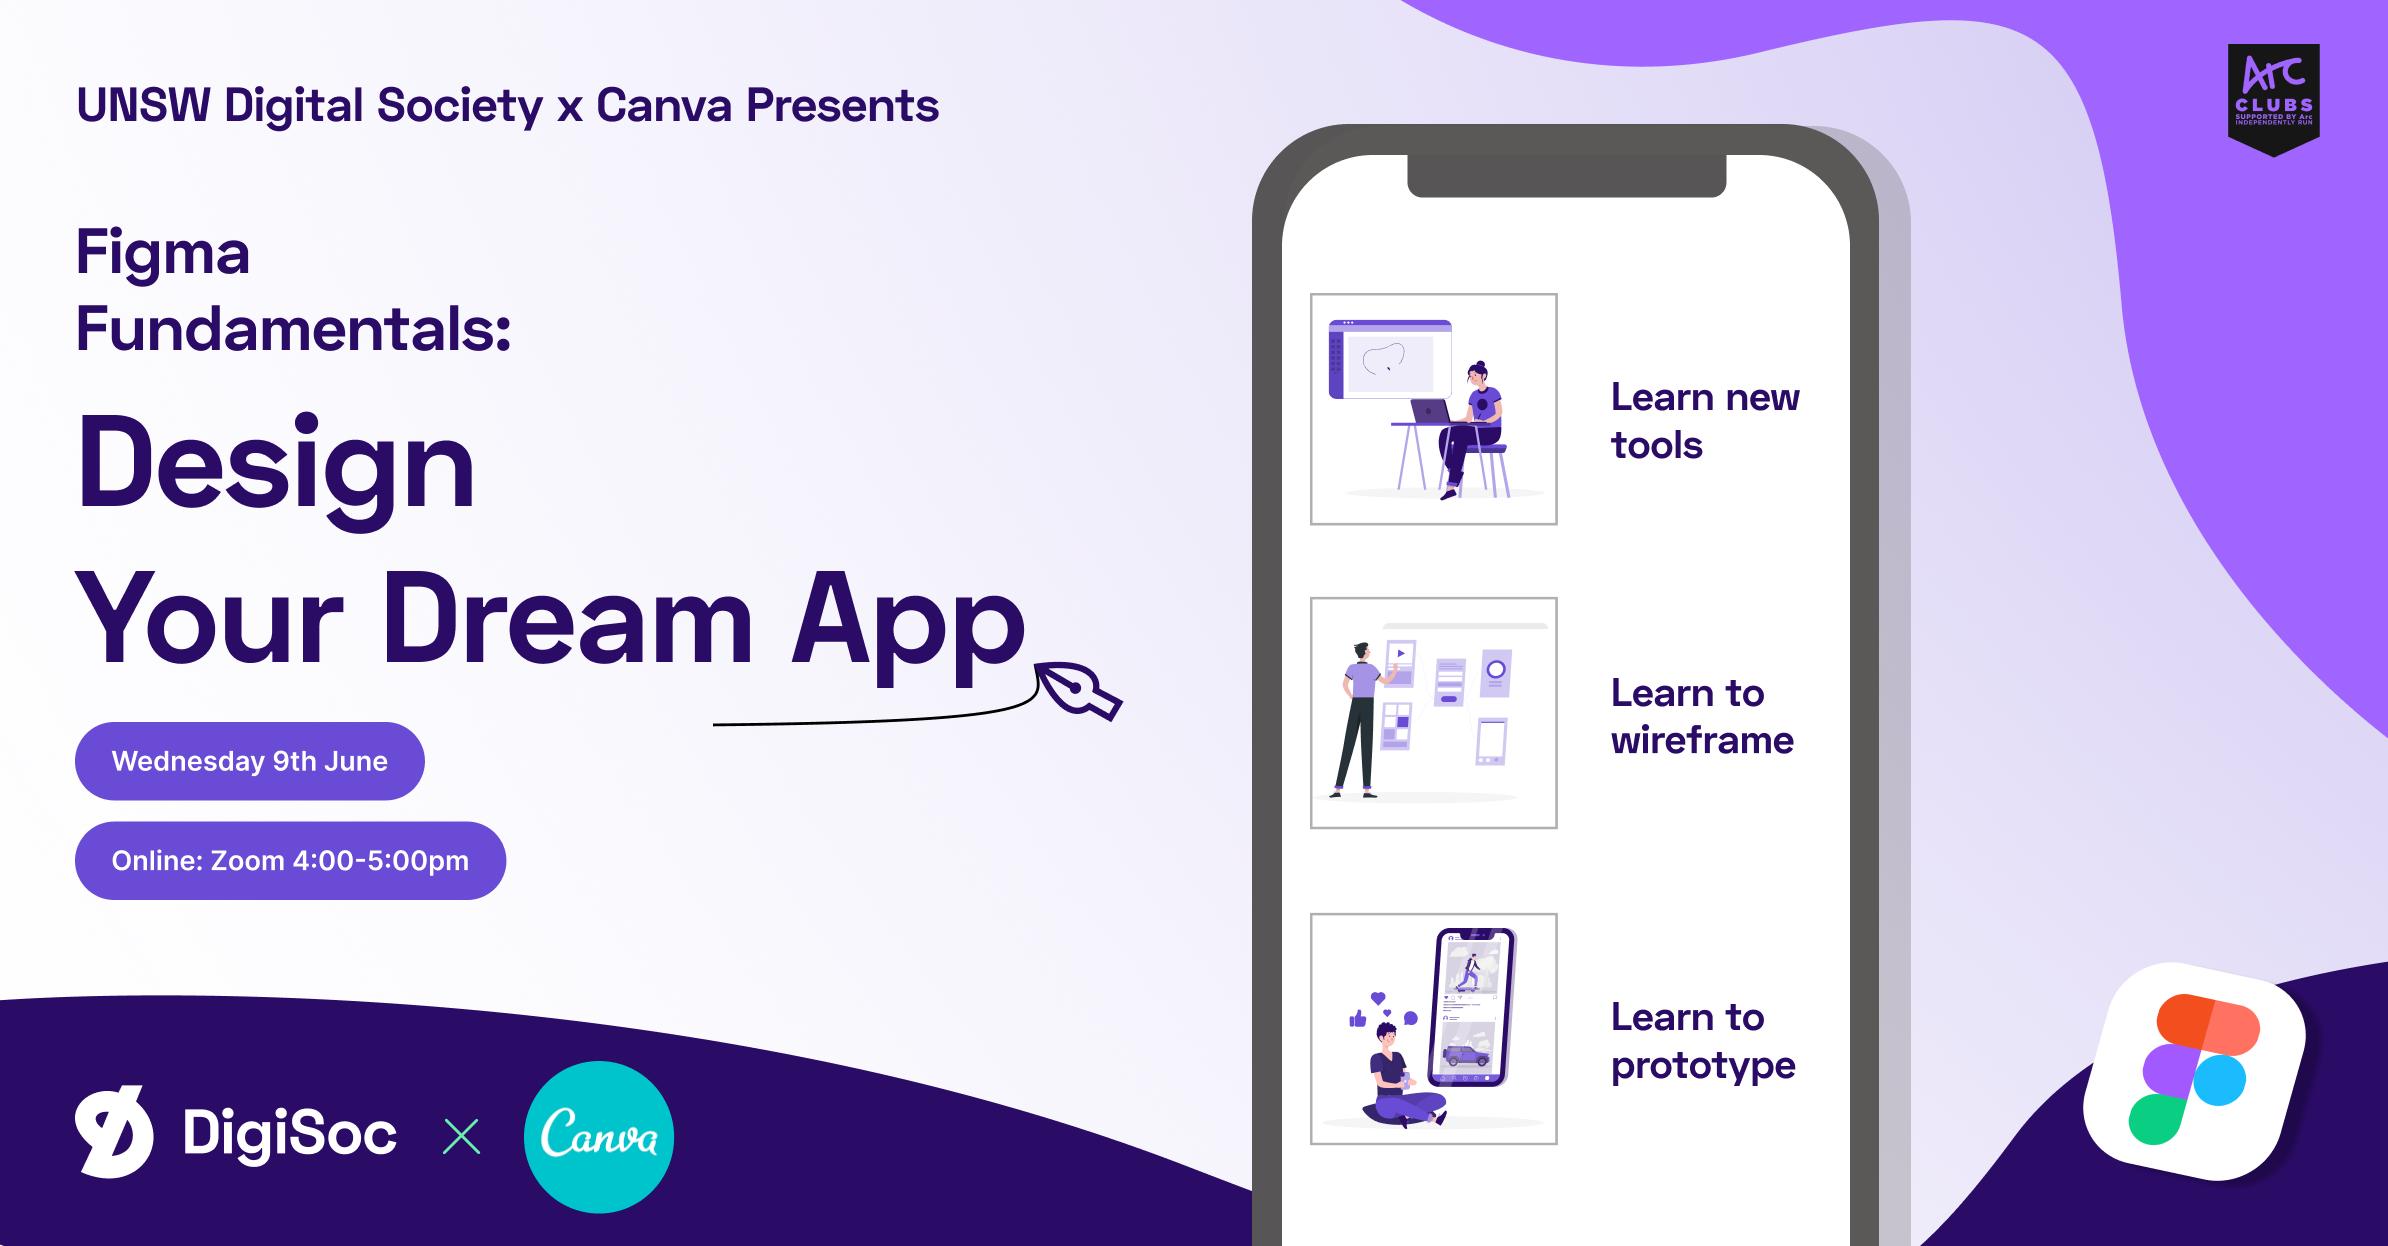 DigiSoc x Canva Presents: Design Your Dream App